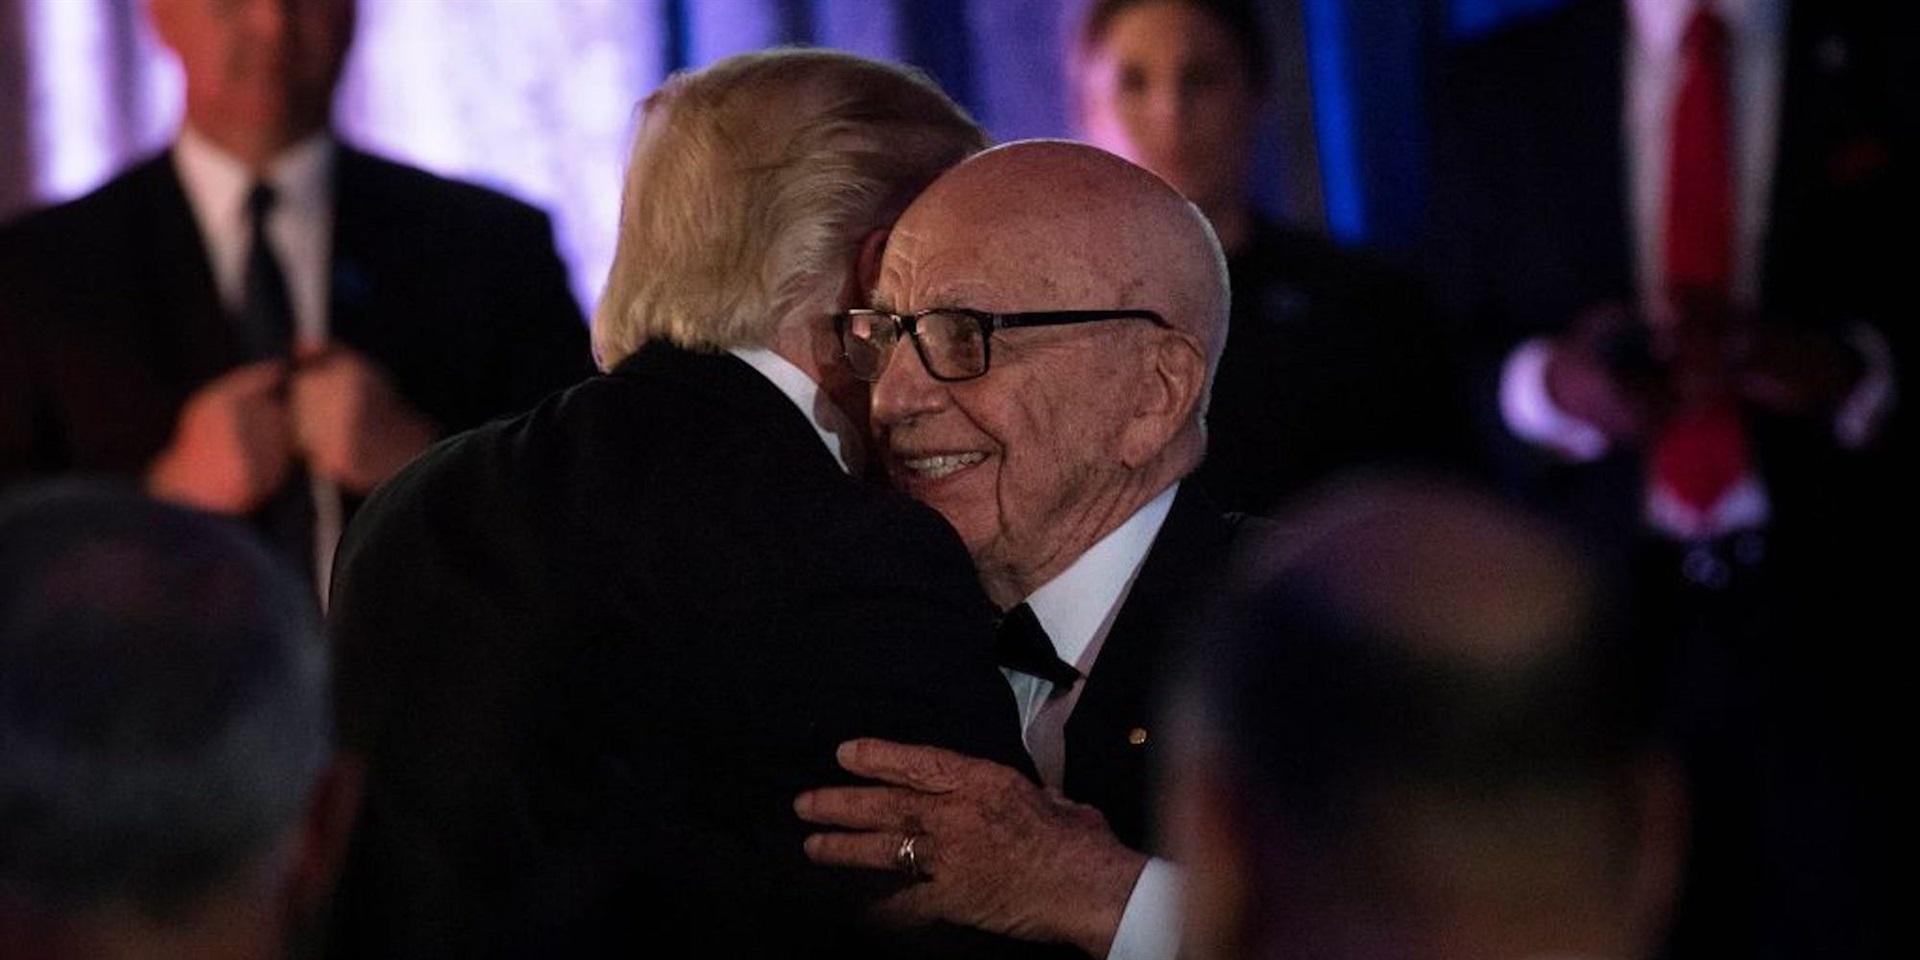 Former US President Donald Trump is embraced by Rupert Murdoch